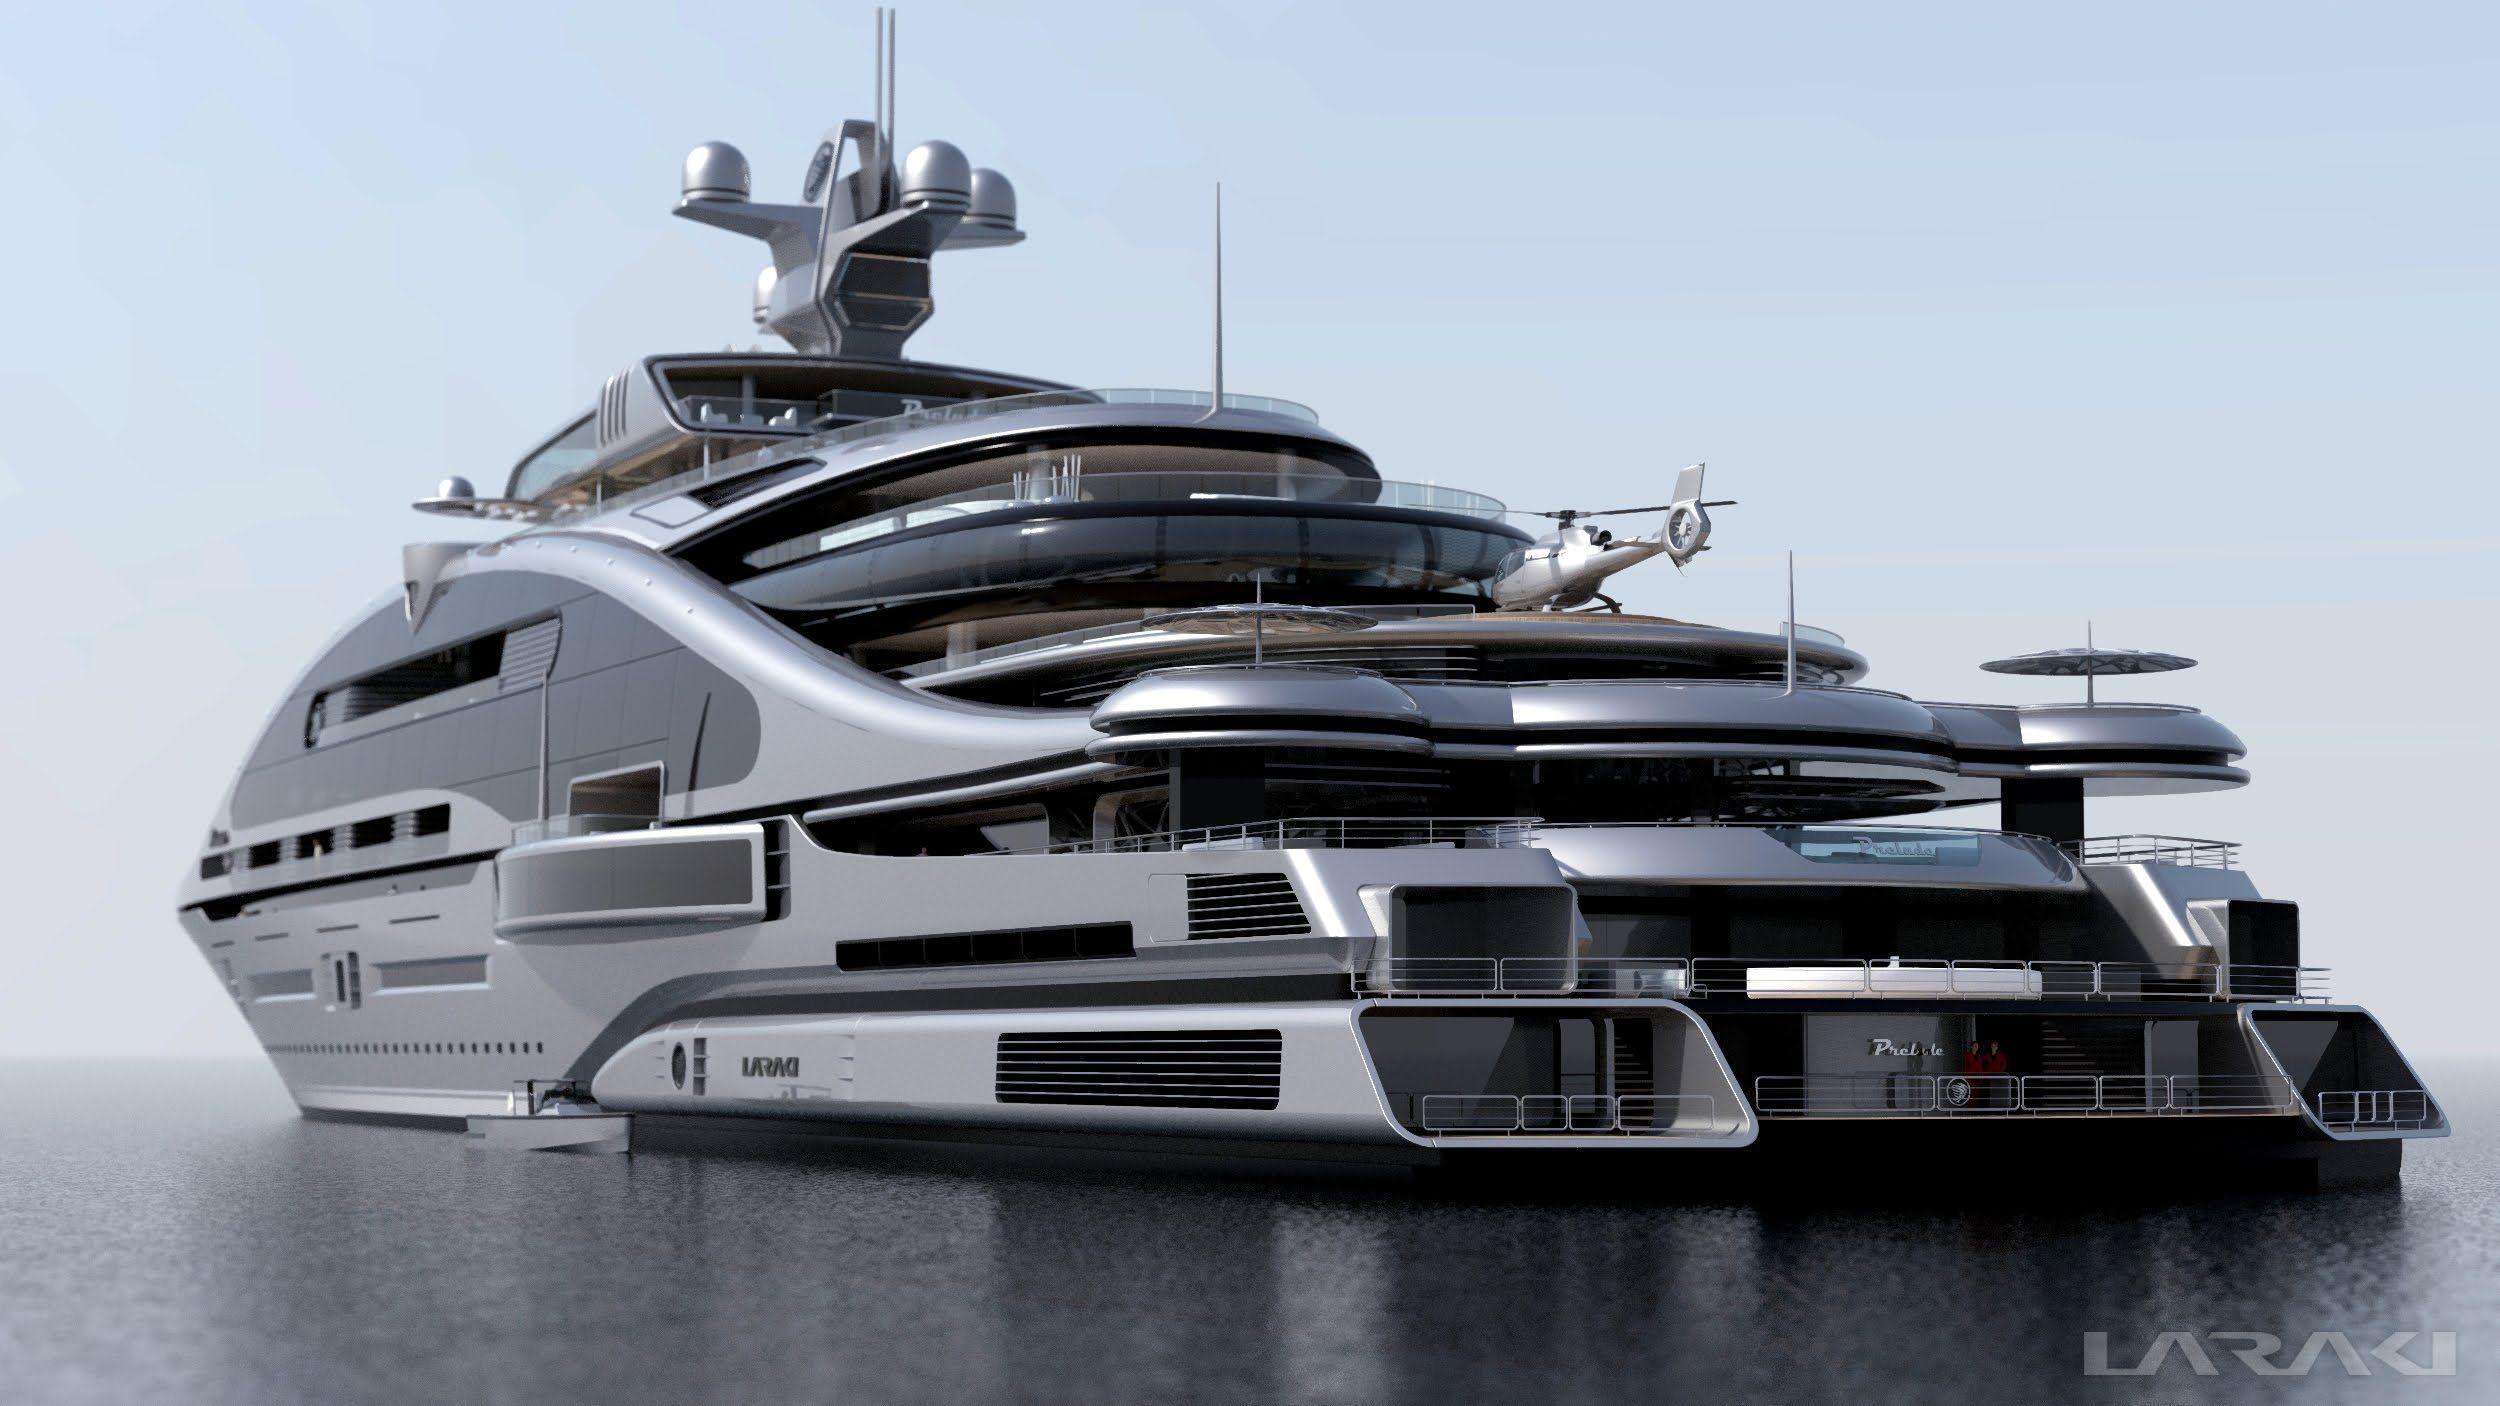 The Best Luxury Cars Luxury Luxurycars Lamborghini Ferrari Cars Supercars Porsche Bmw Audi Supercar Mercedesamg M Luxury Yachts Super Yachts Boat